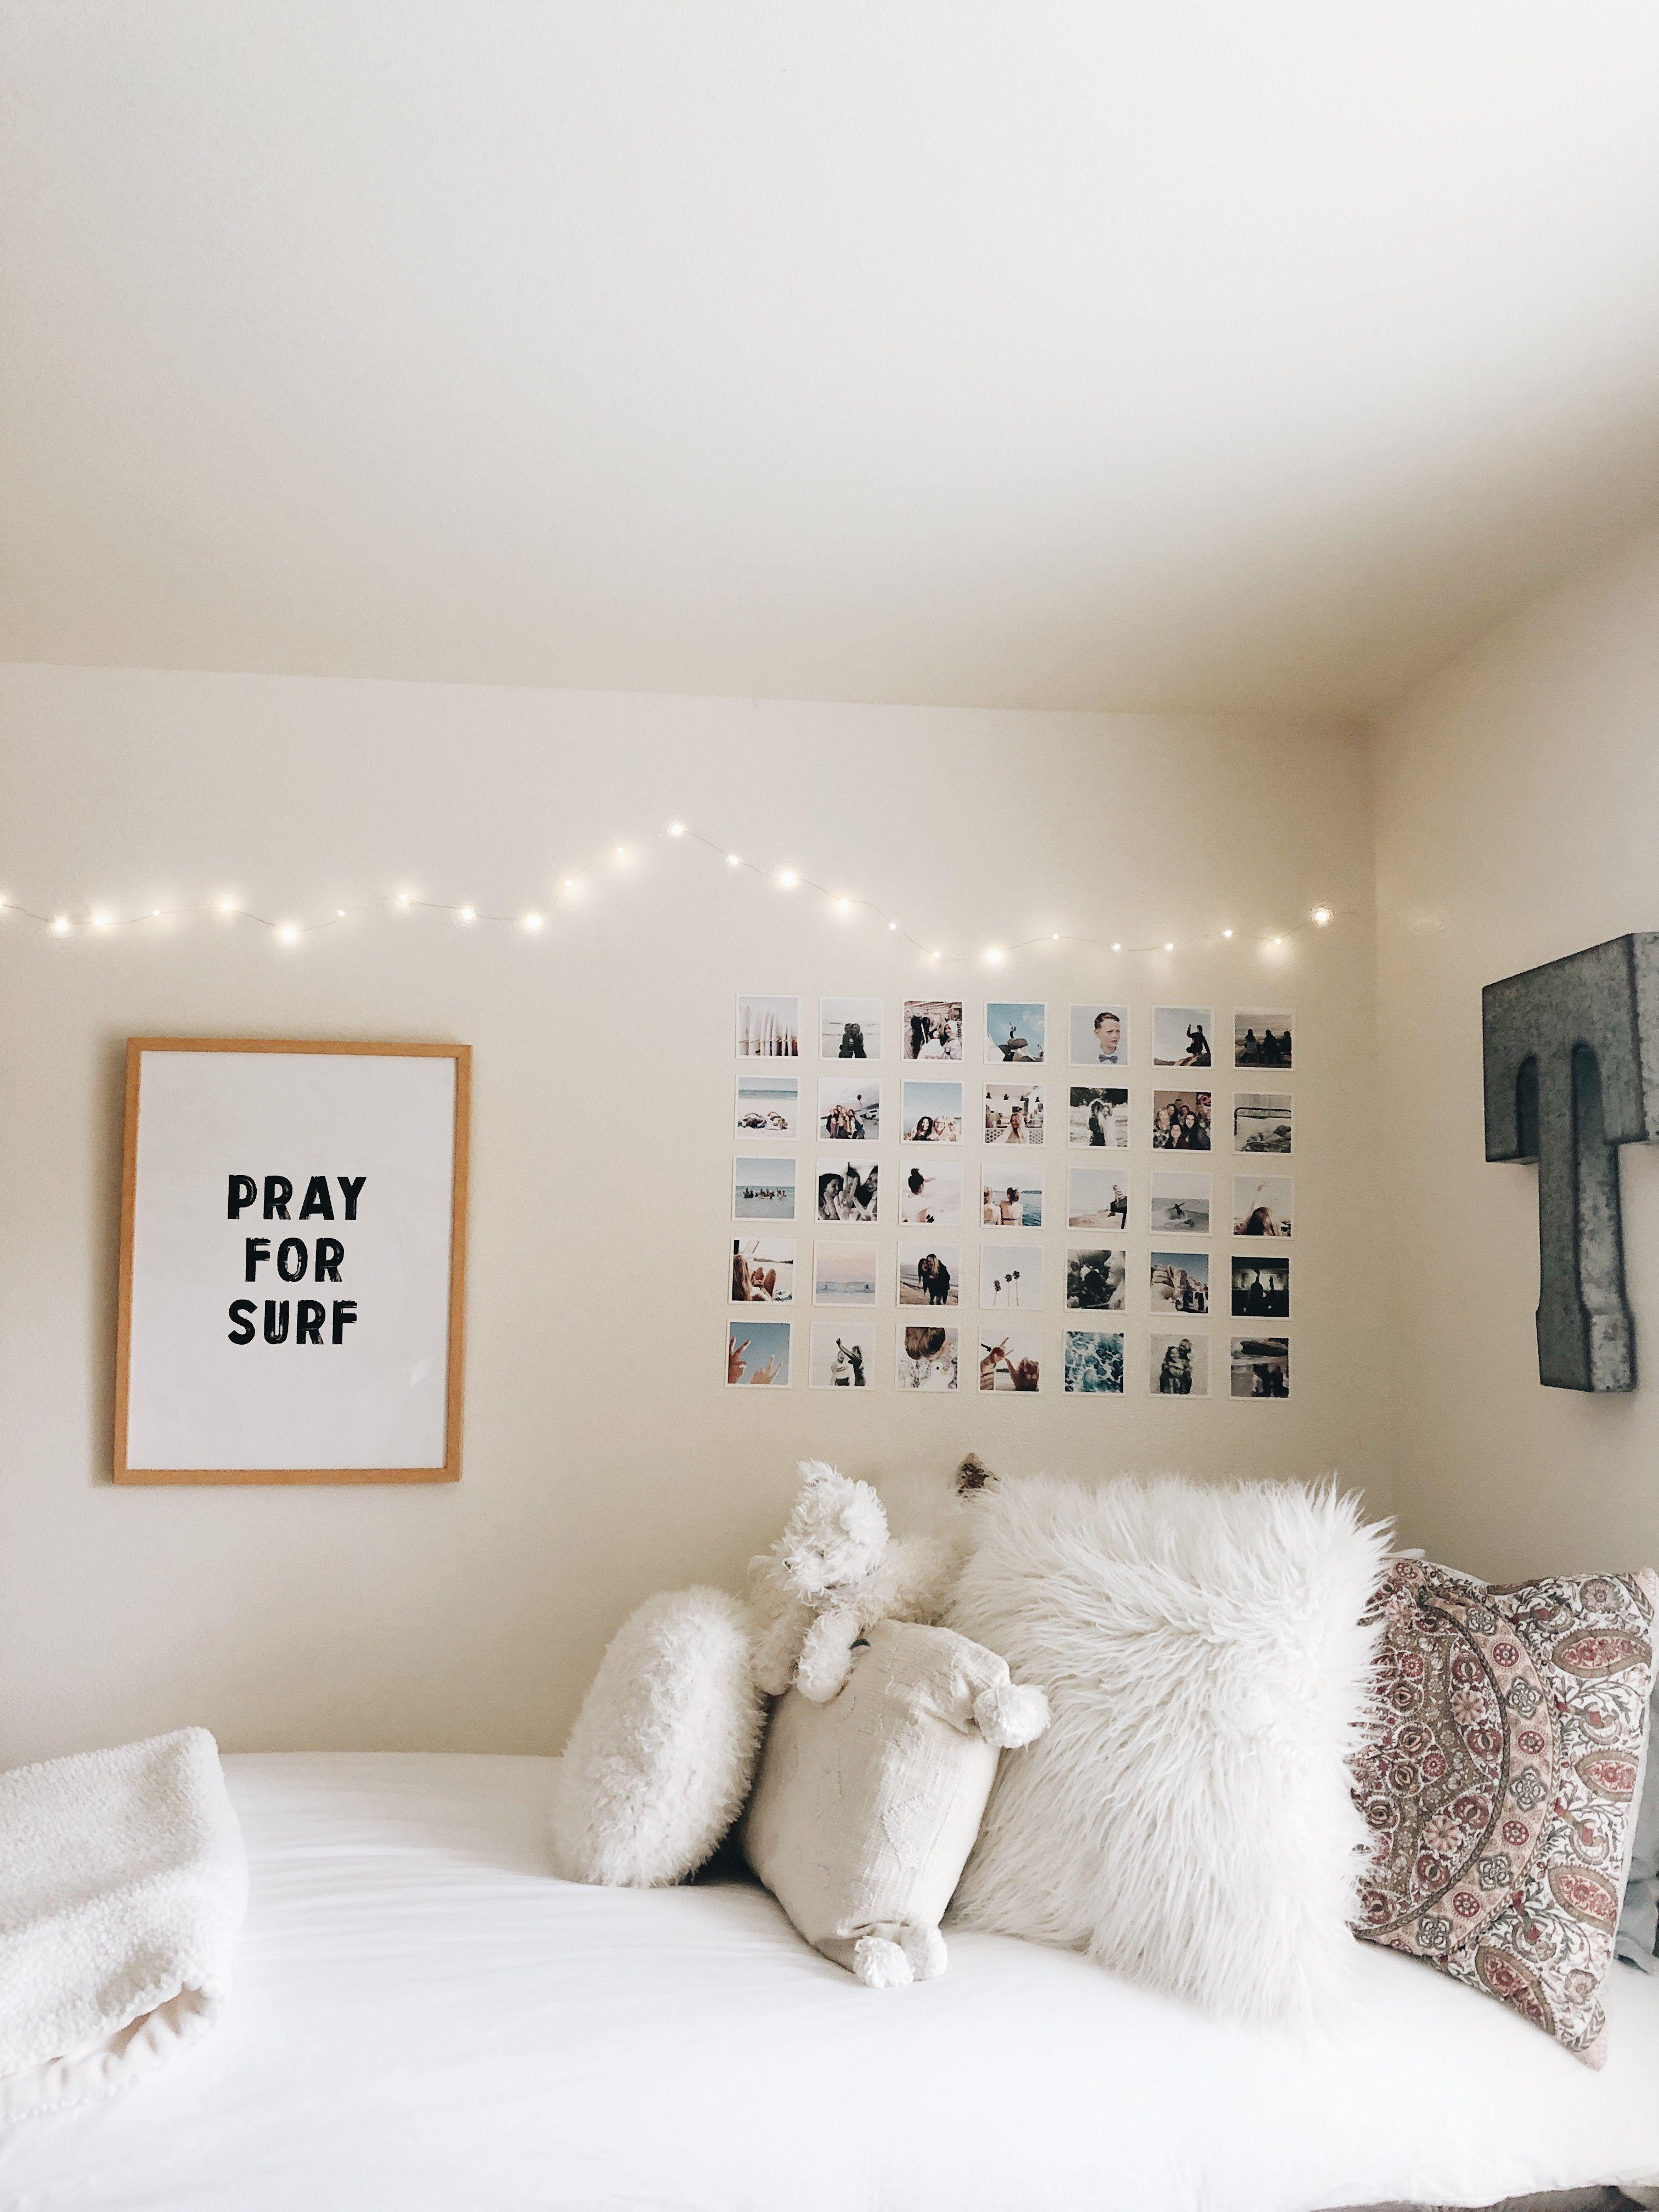 50 Vsco Bedroom Ideas For The 2020 Dorm Room Decor Room Inspiration Room Ideas Bedroom